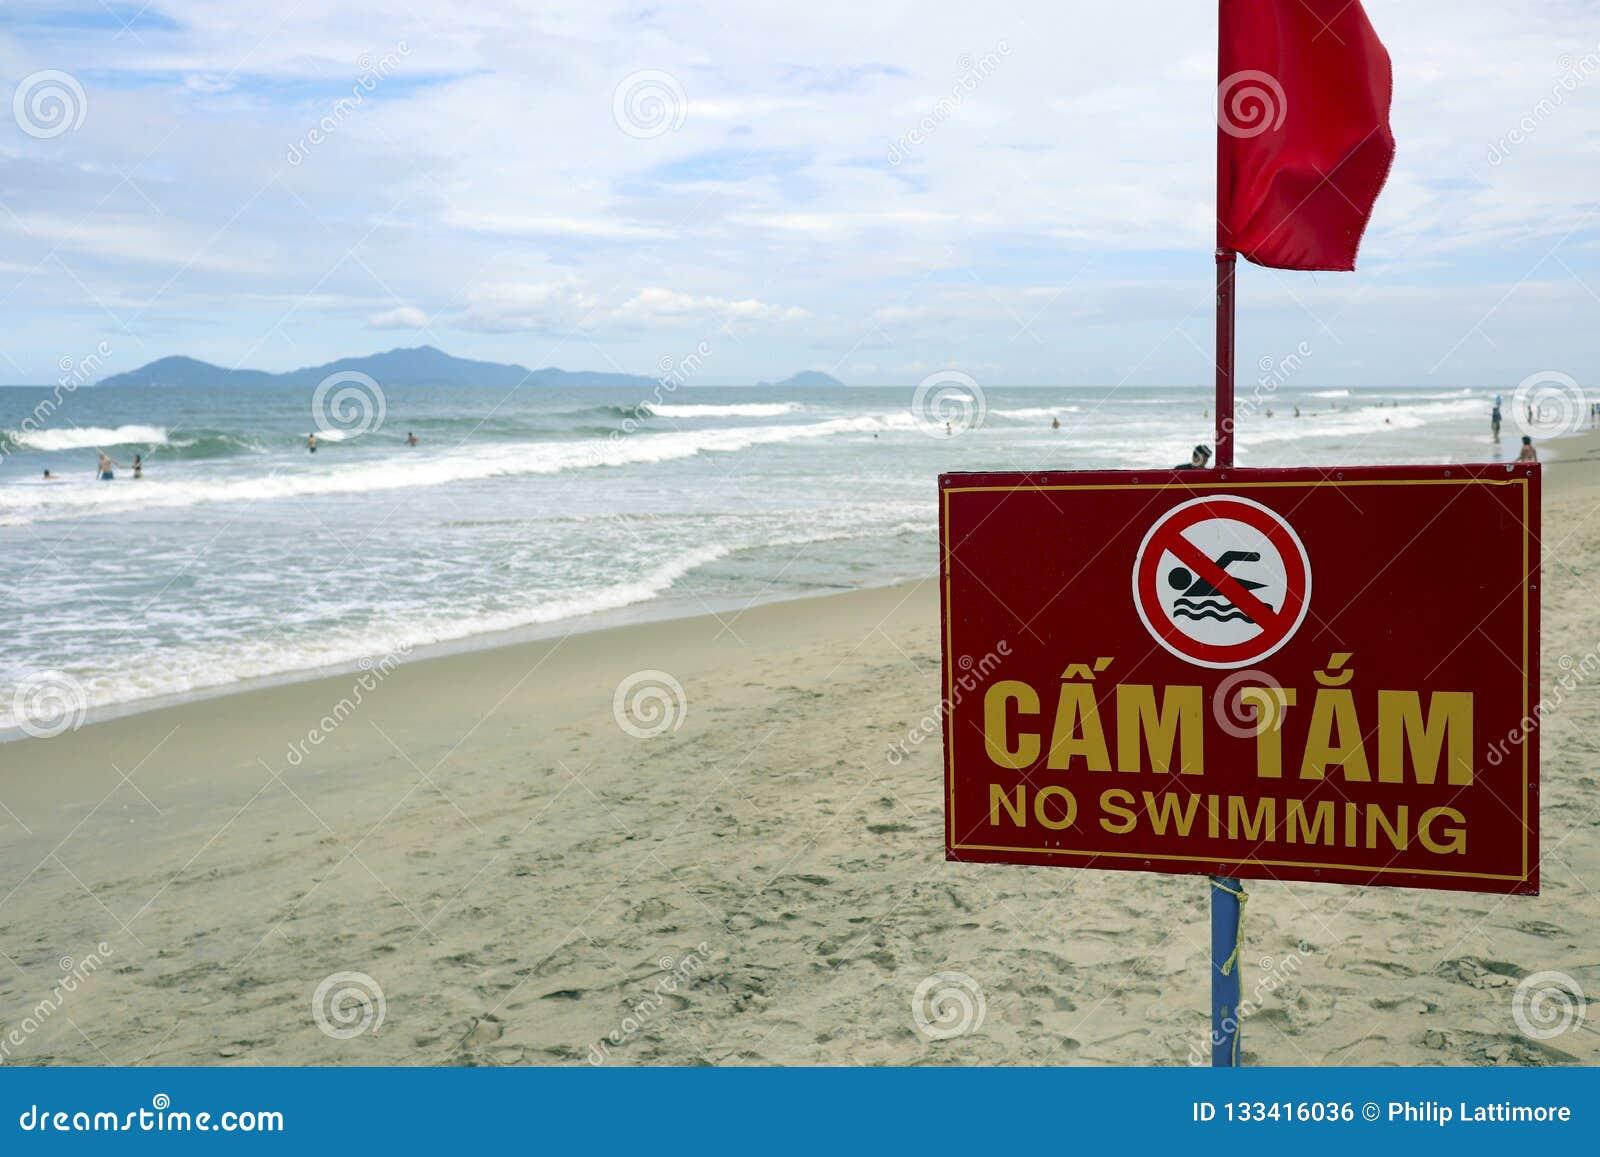 No swiiming sign on a beach in hoi an vietnam